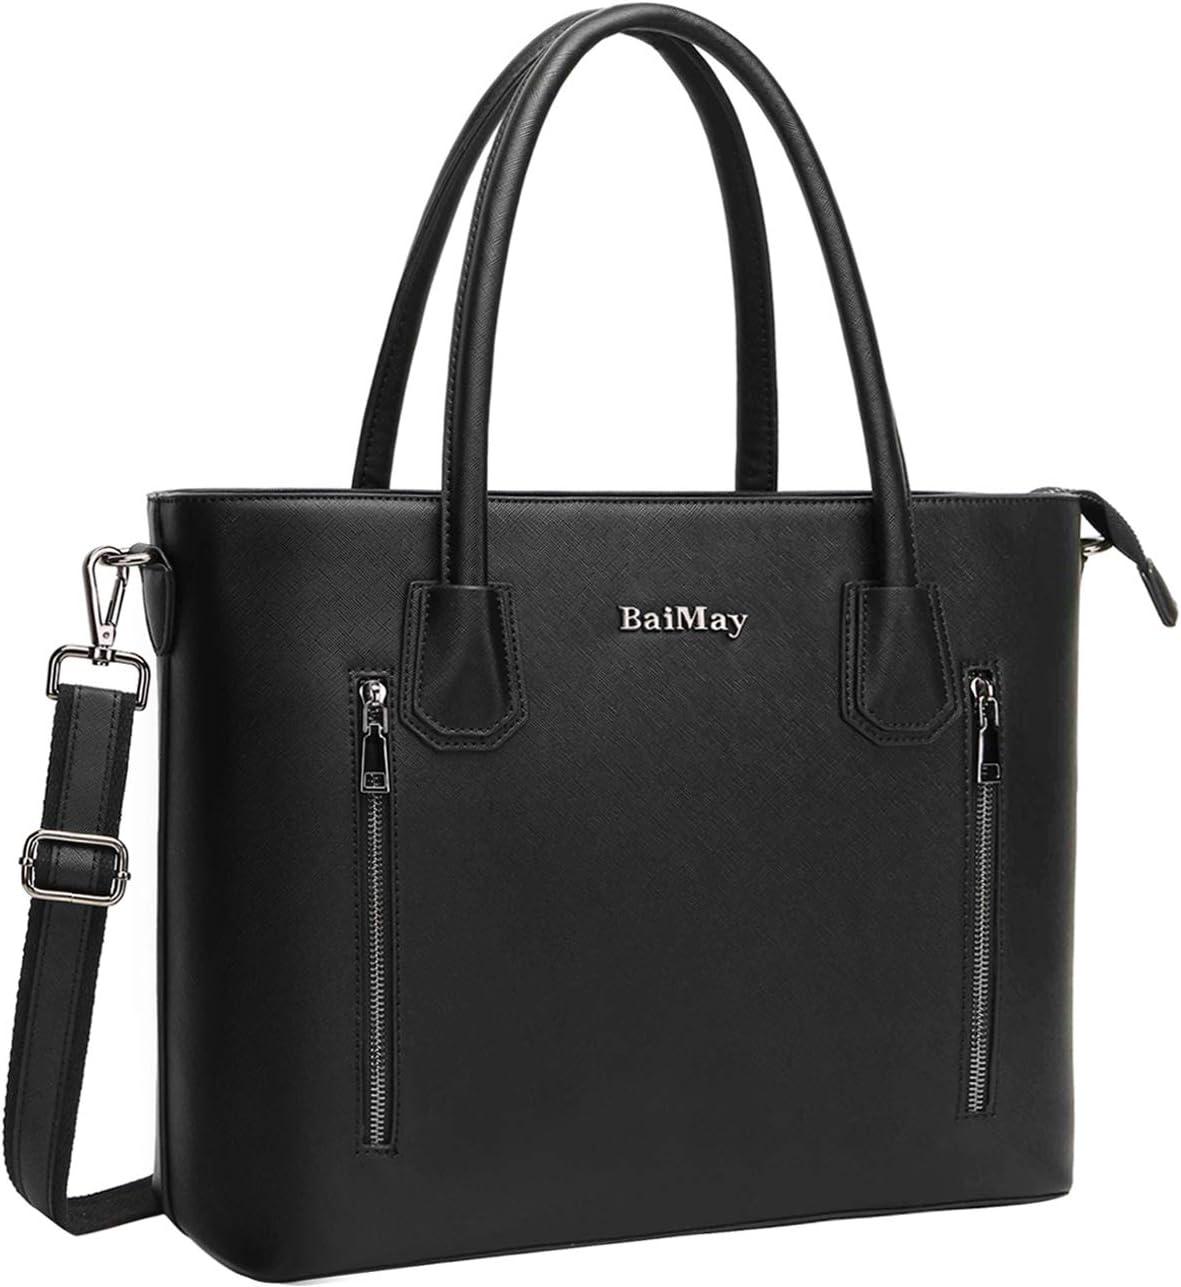 Laptop Bag for Women,15.6-17 Inch Laptop Tote Roomy Work Bag-Black 17in